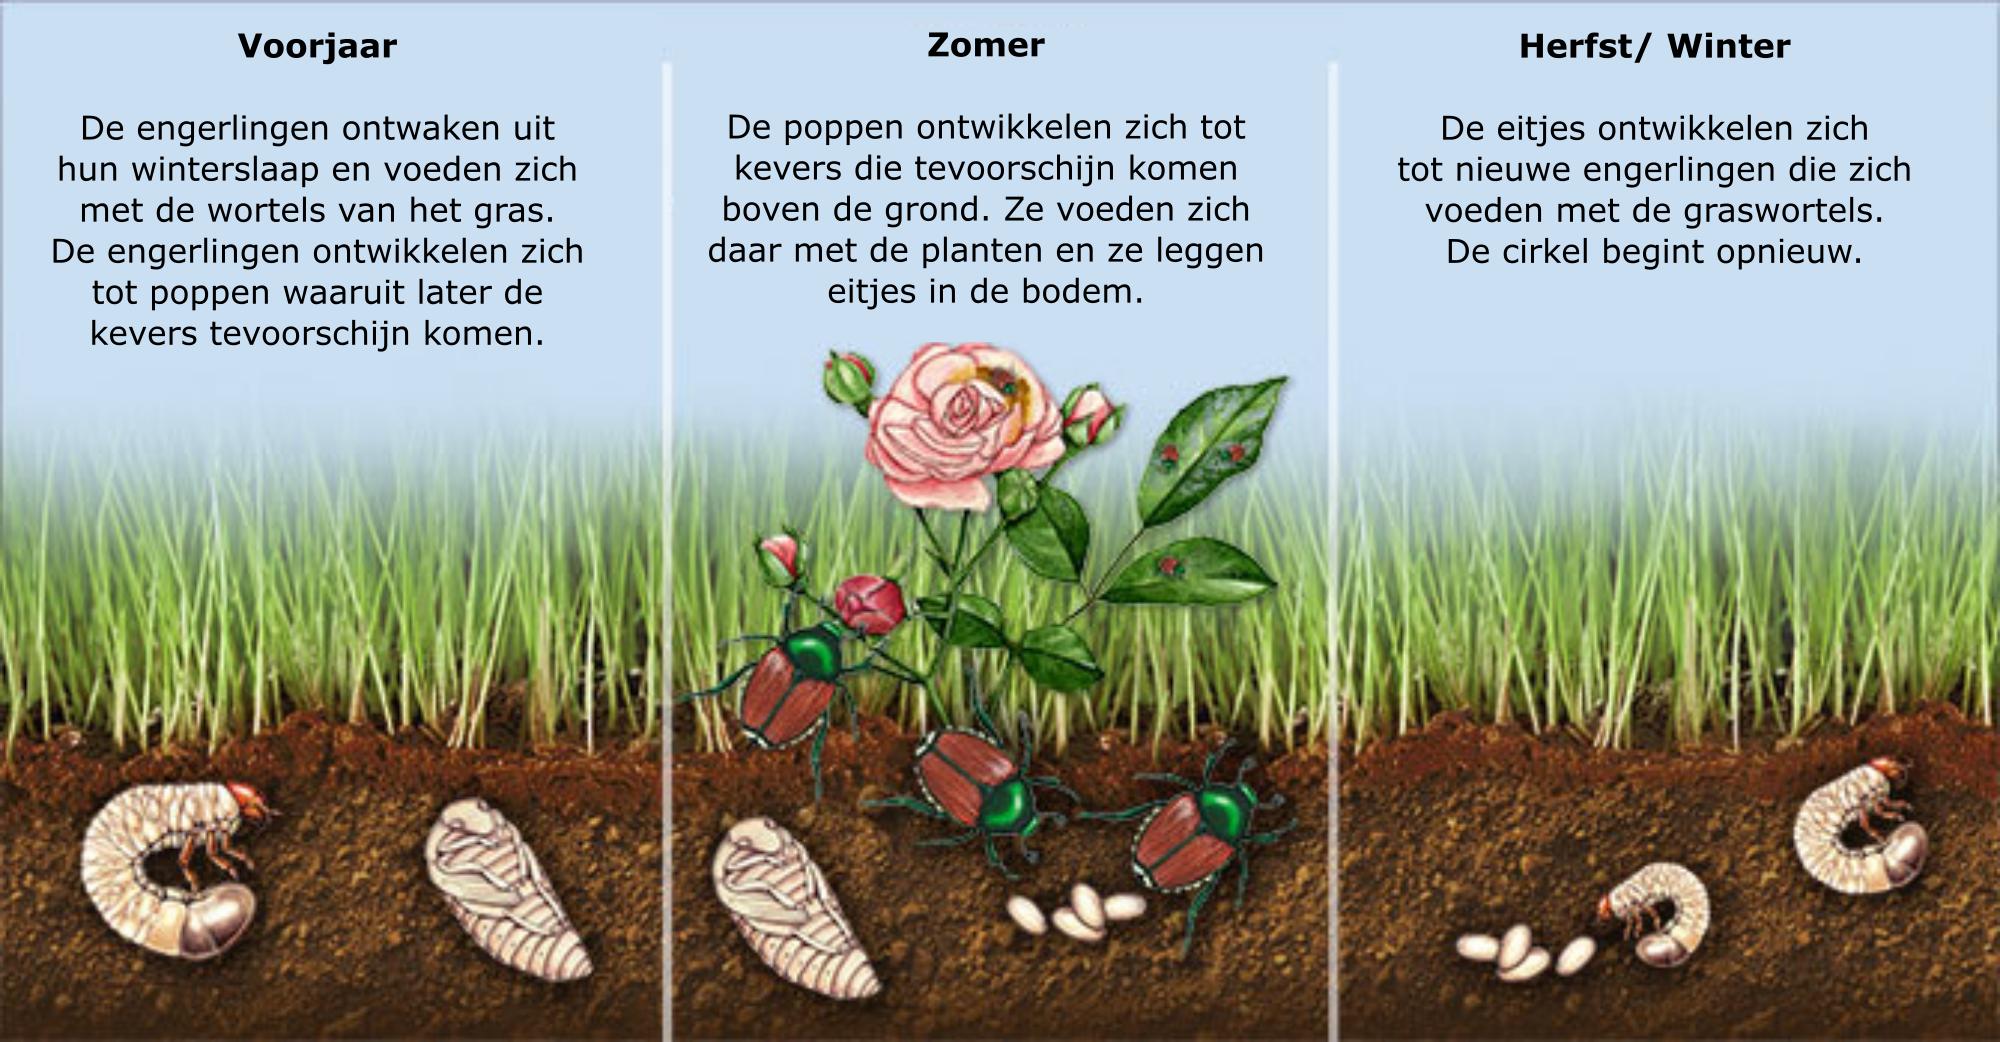 levenscyclus engerlingen in de bodem